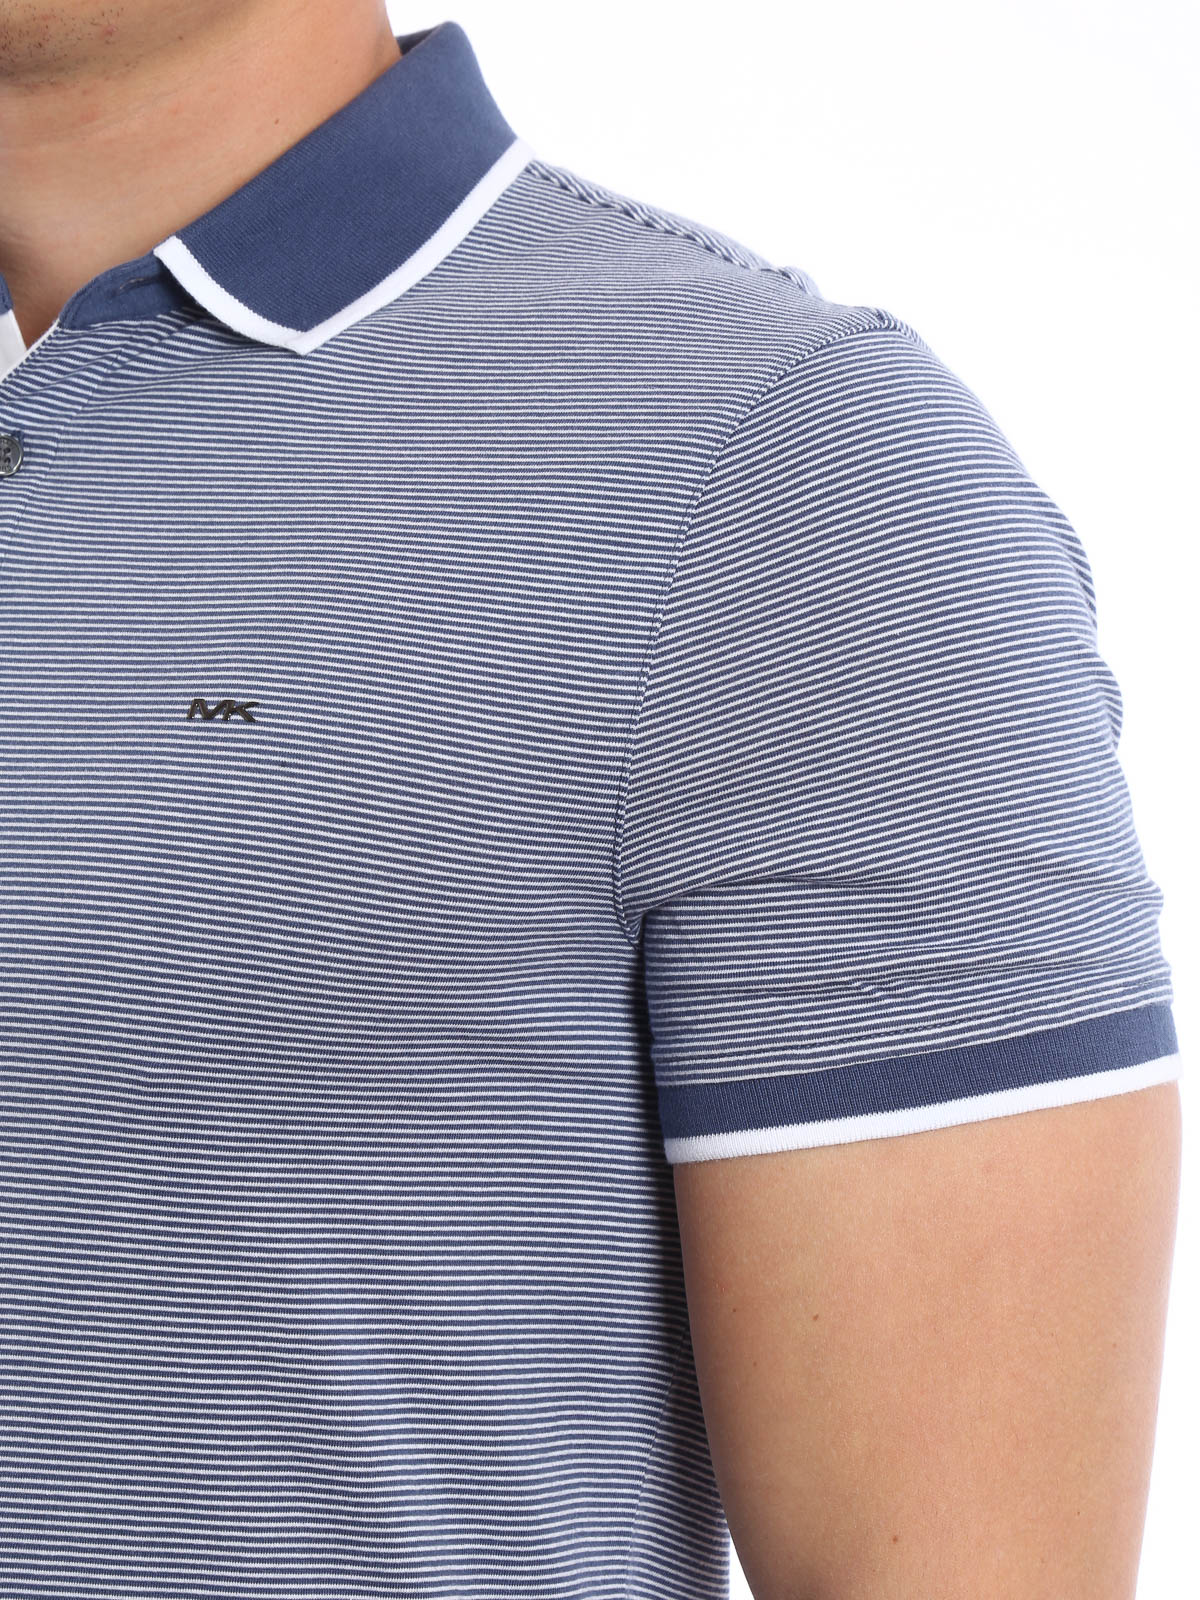 8dce33b0d Michael Kors - Striped polo shirt - polo shirts - CS65FY21WV CHAMBRAY